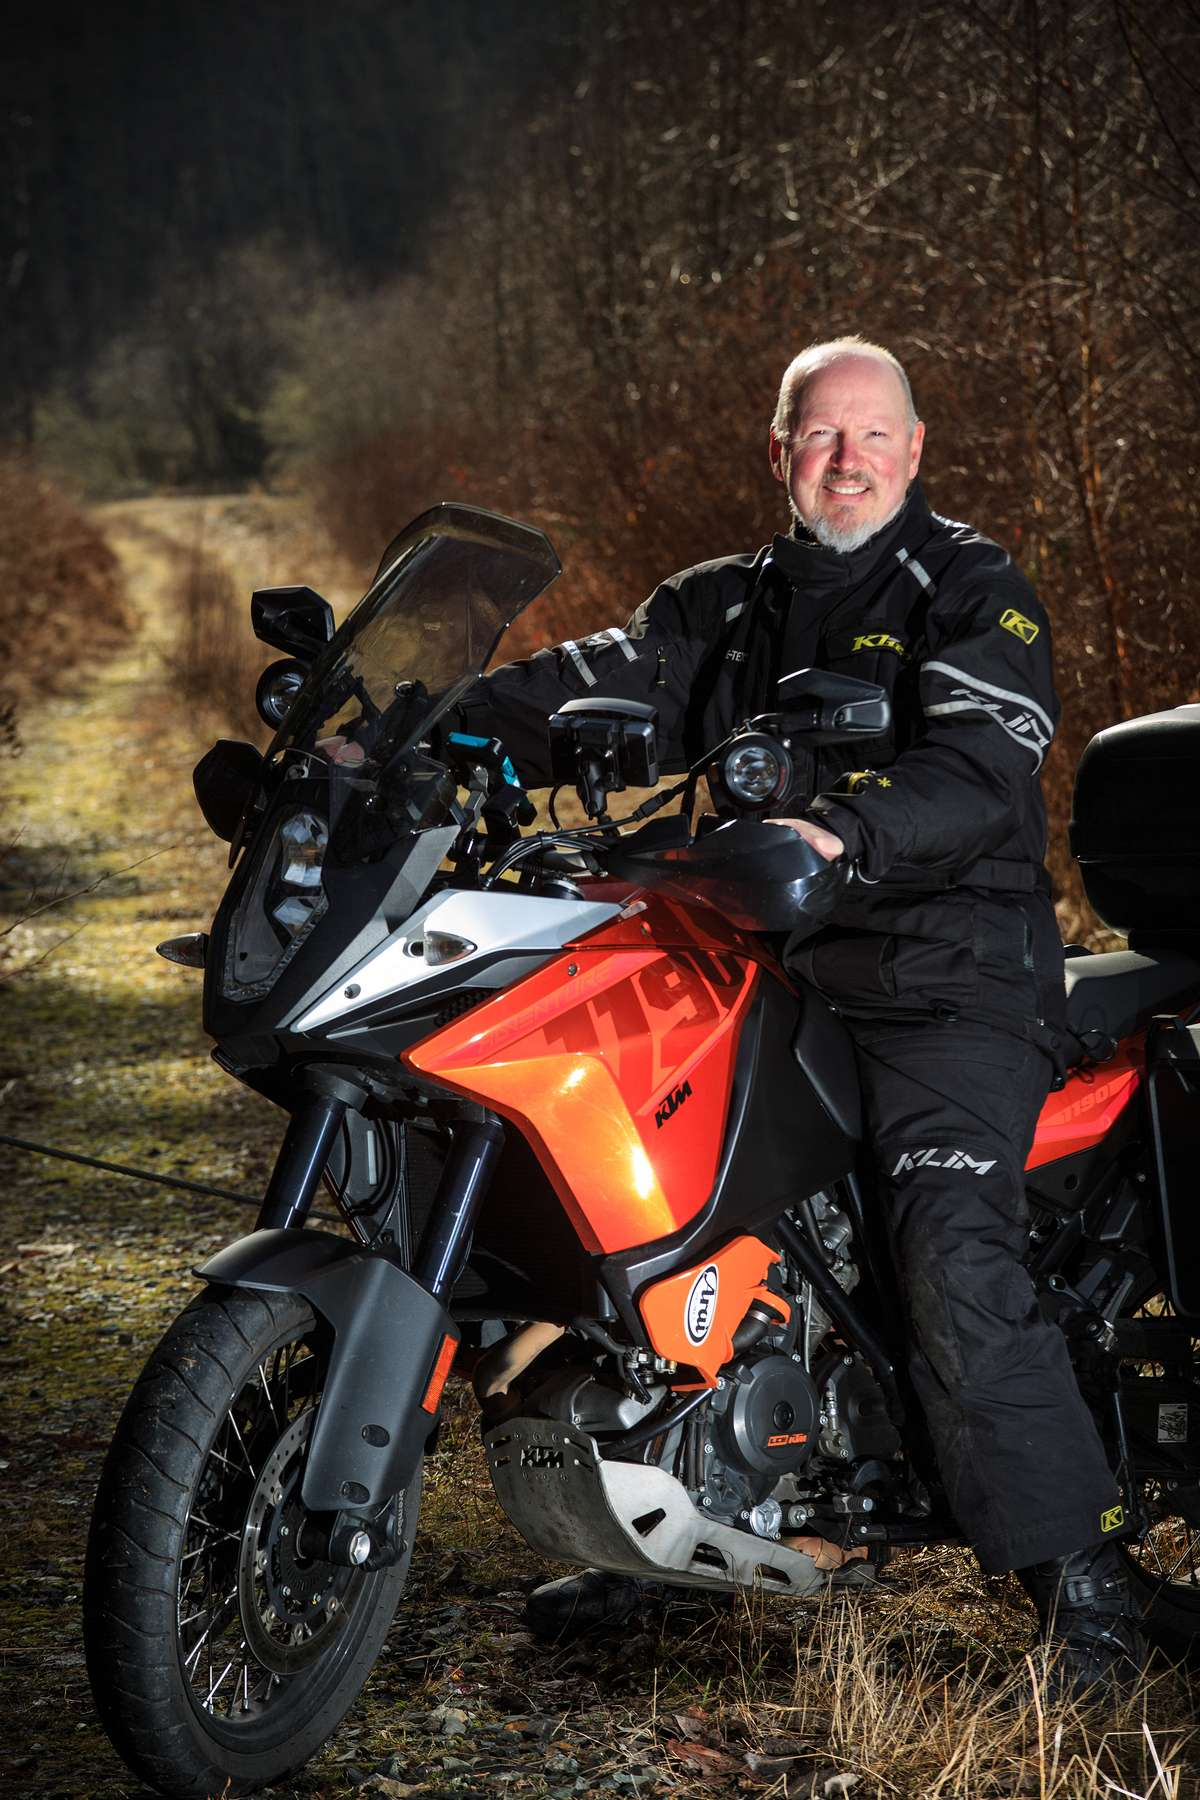 084-editorial-magazine-portraits-motorcyclist.jpg